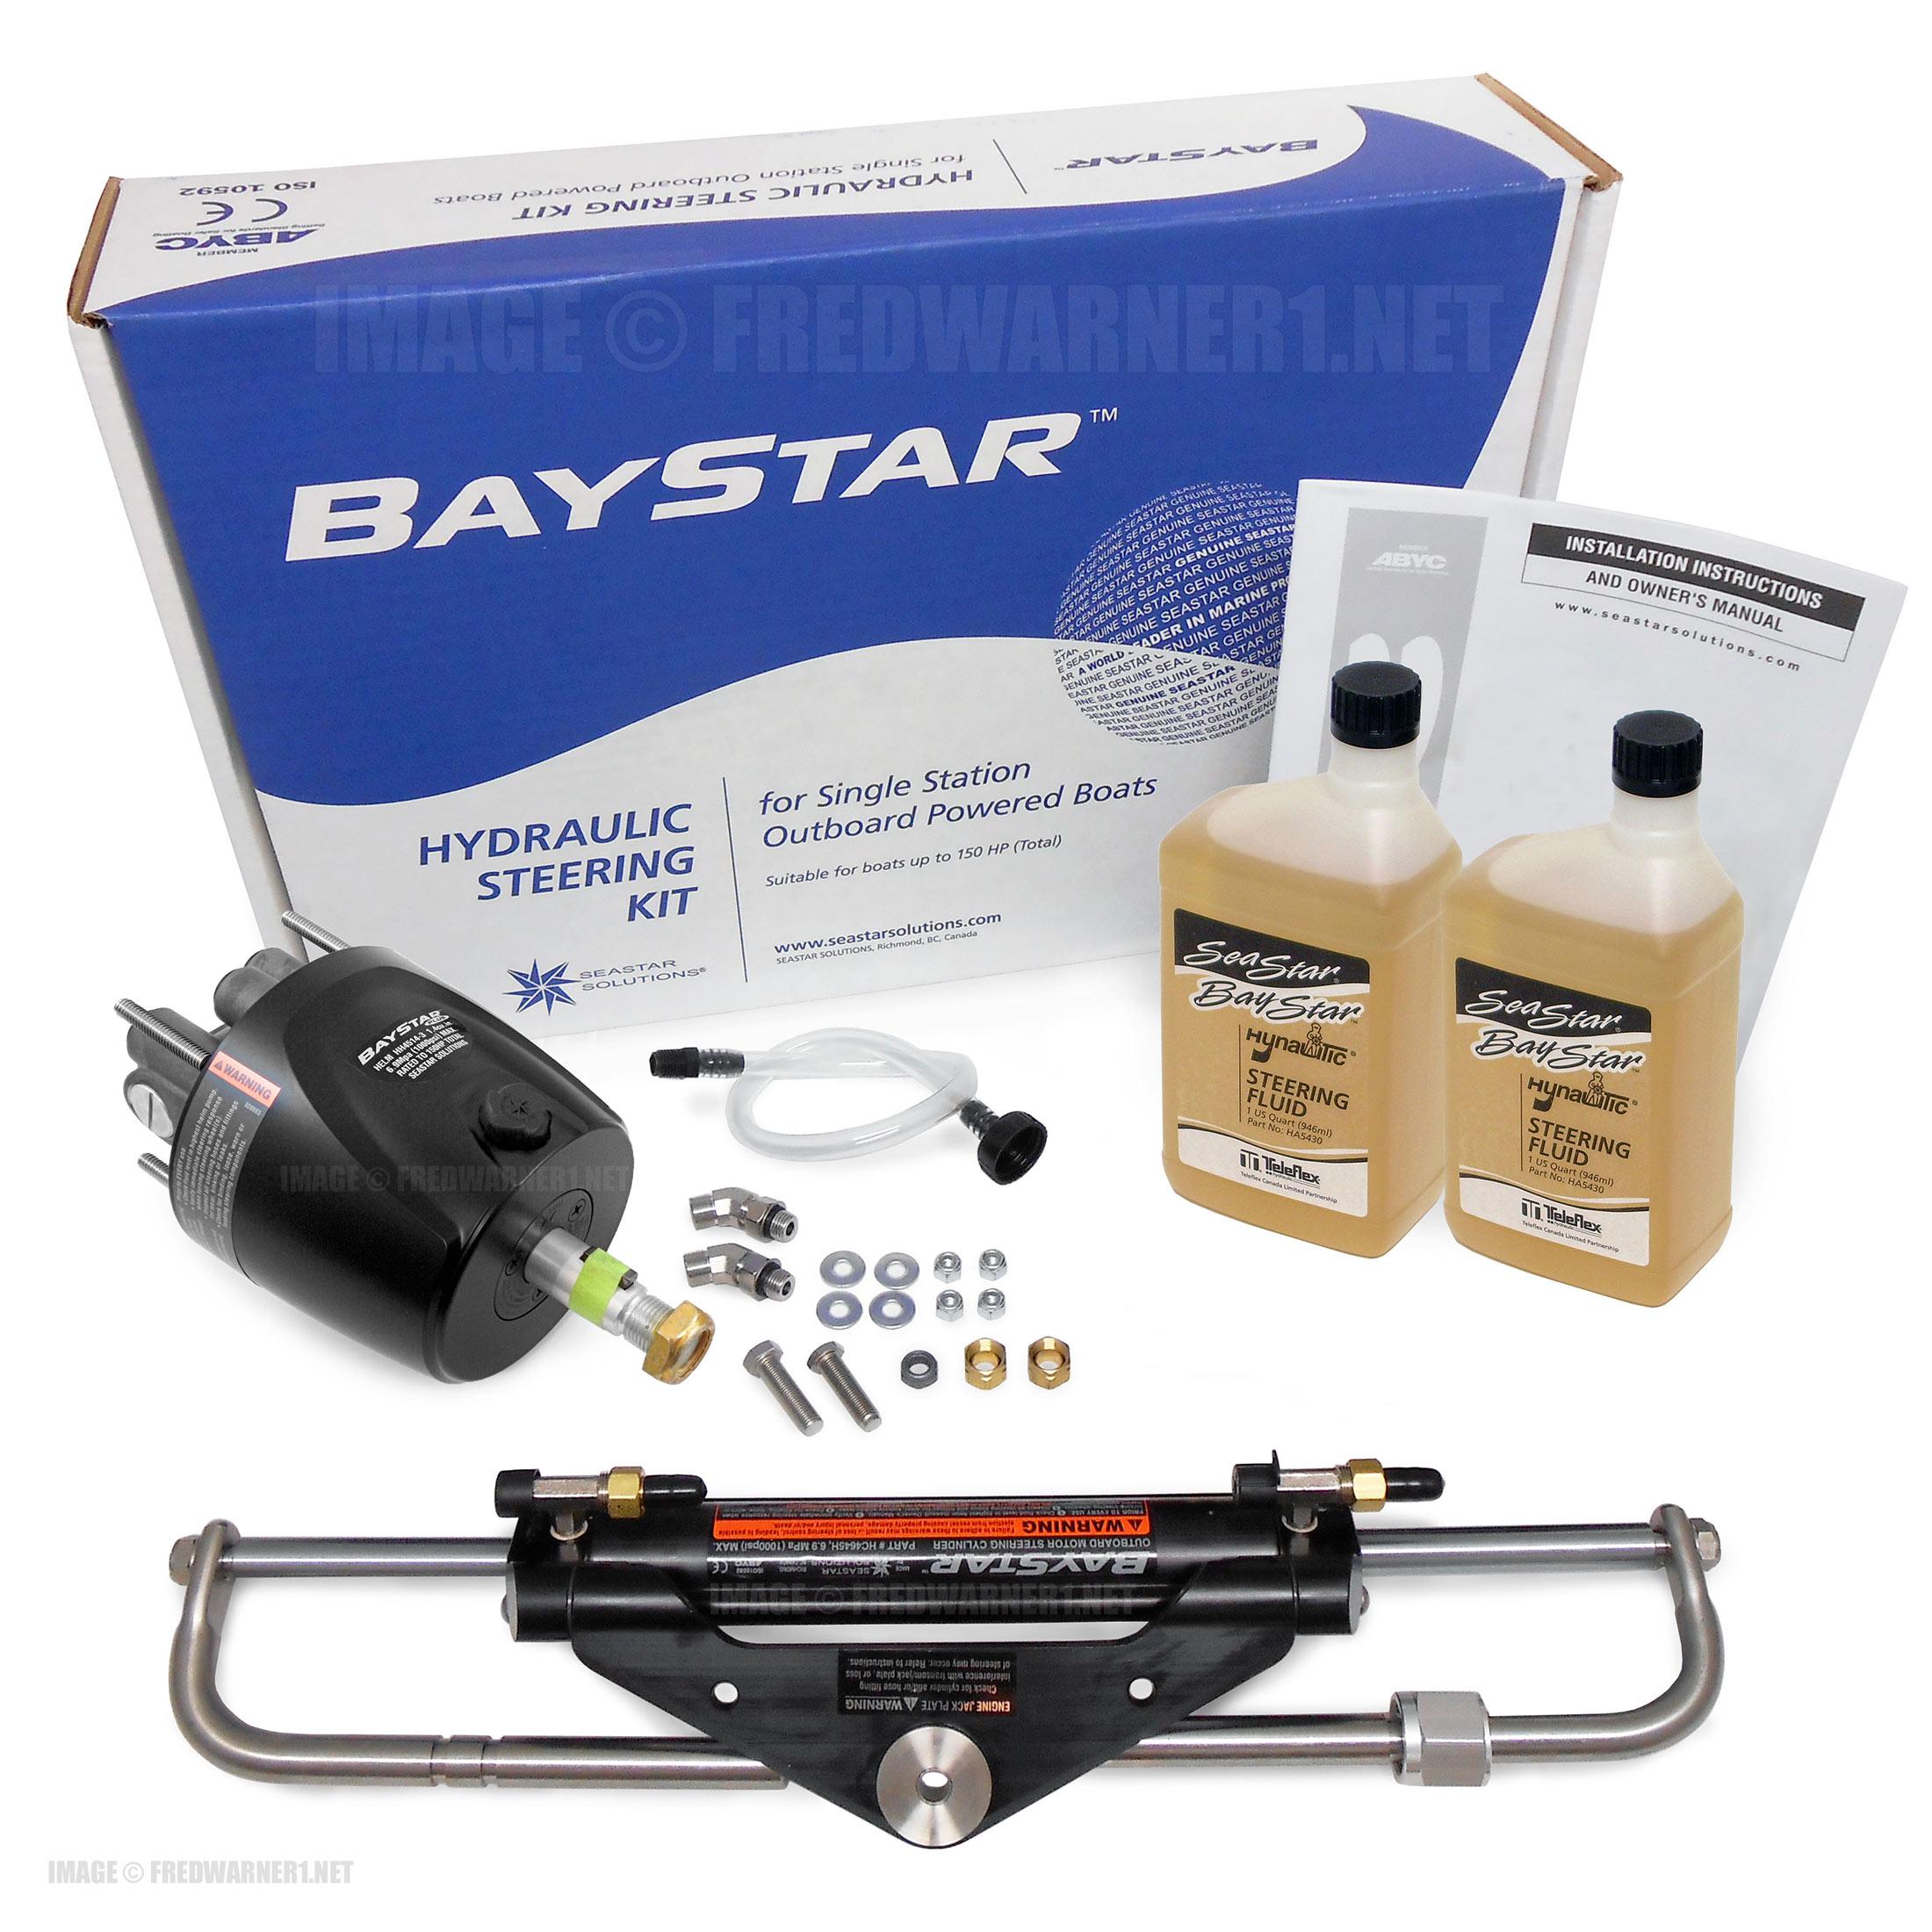 SeaStar HK4500A-3 BayStar Plus Hydraulic Outboard Steering Kit (No Hoses)